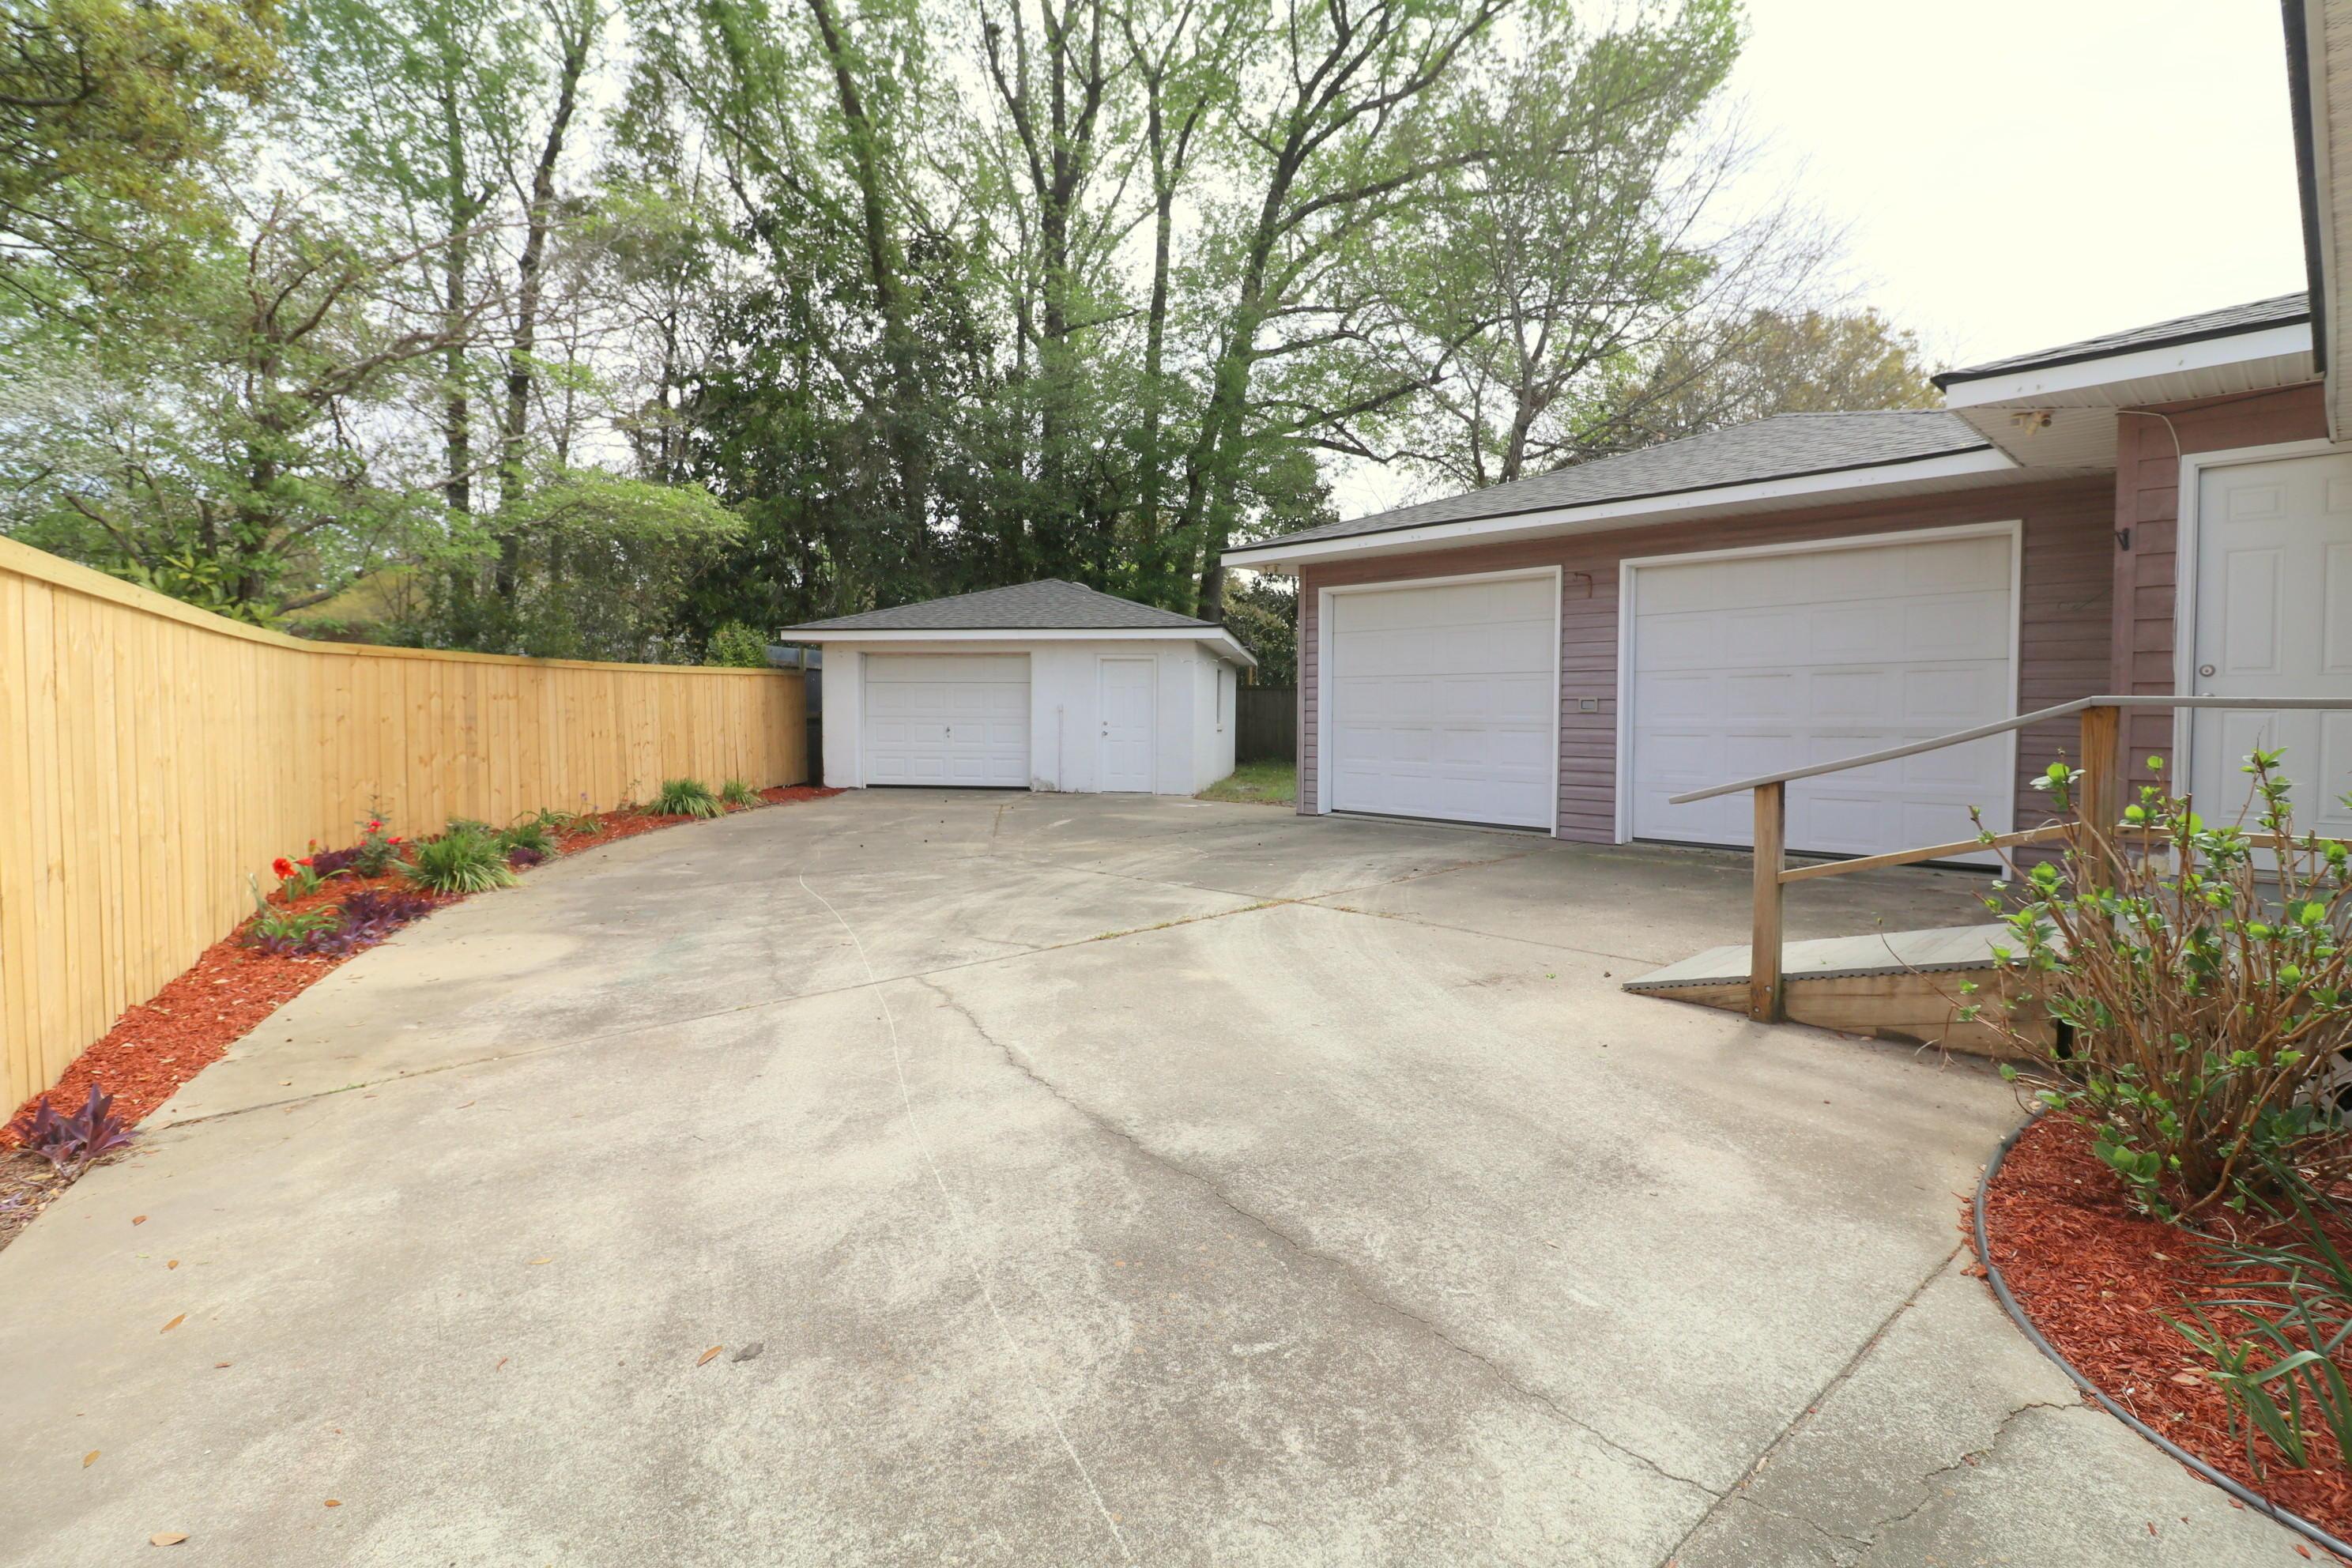 Park Circle Homes For Sale - 5274 Potomac, North Charleston, SC - 1